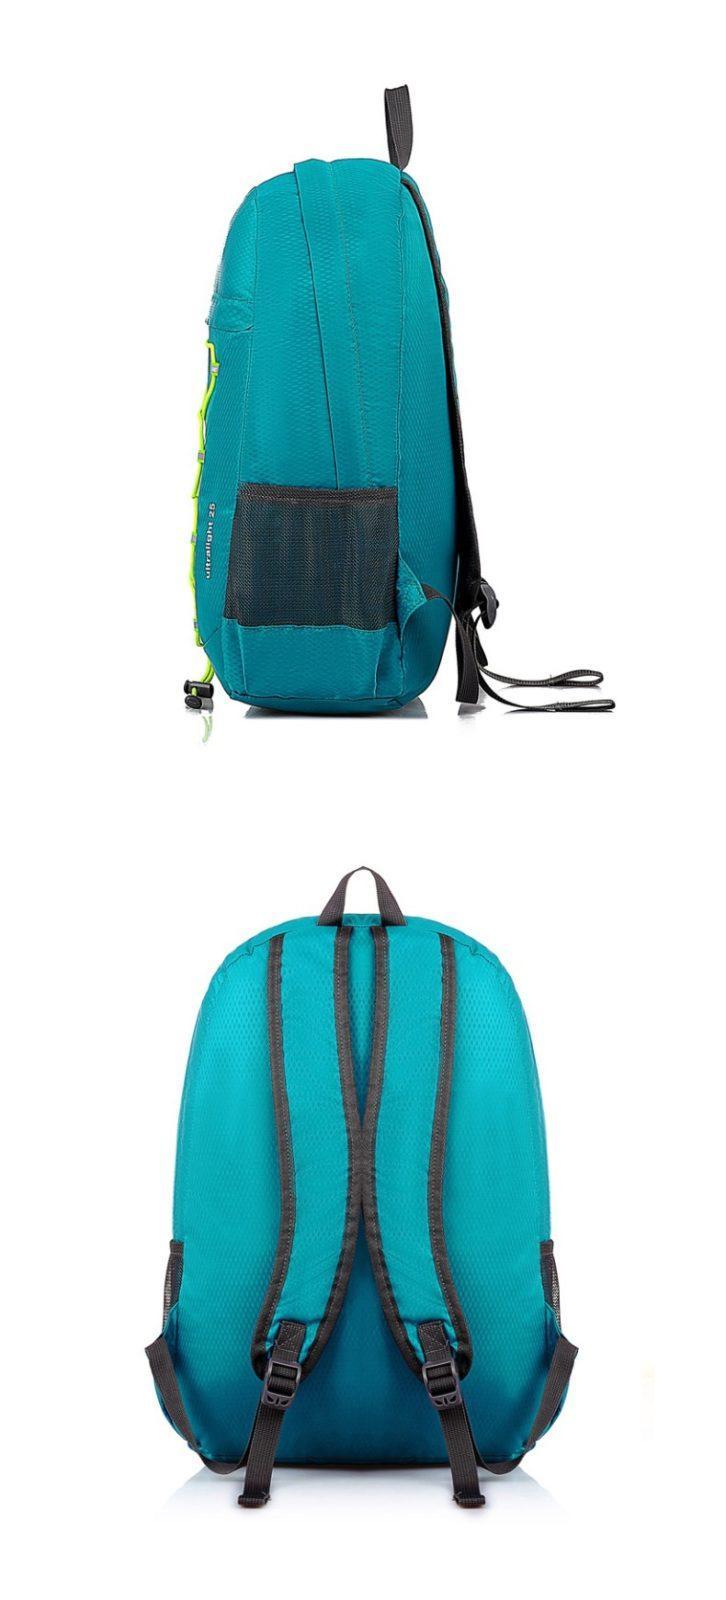 sverhlegkij vodonepronicaemyj skladnoj rjukzak portalife 17 - Сверхлегкий водонепроницаемый складной рюкзак PortaLife